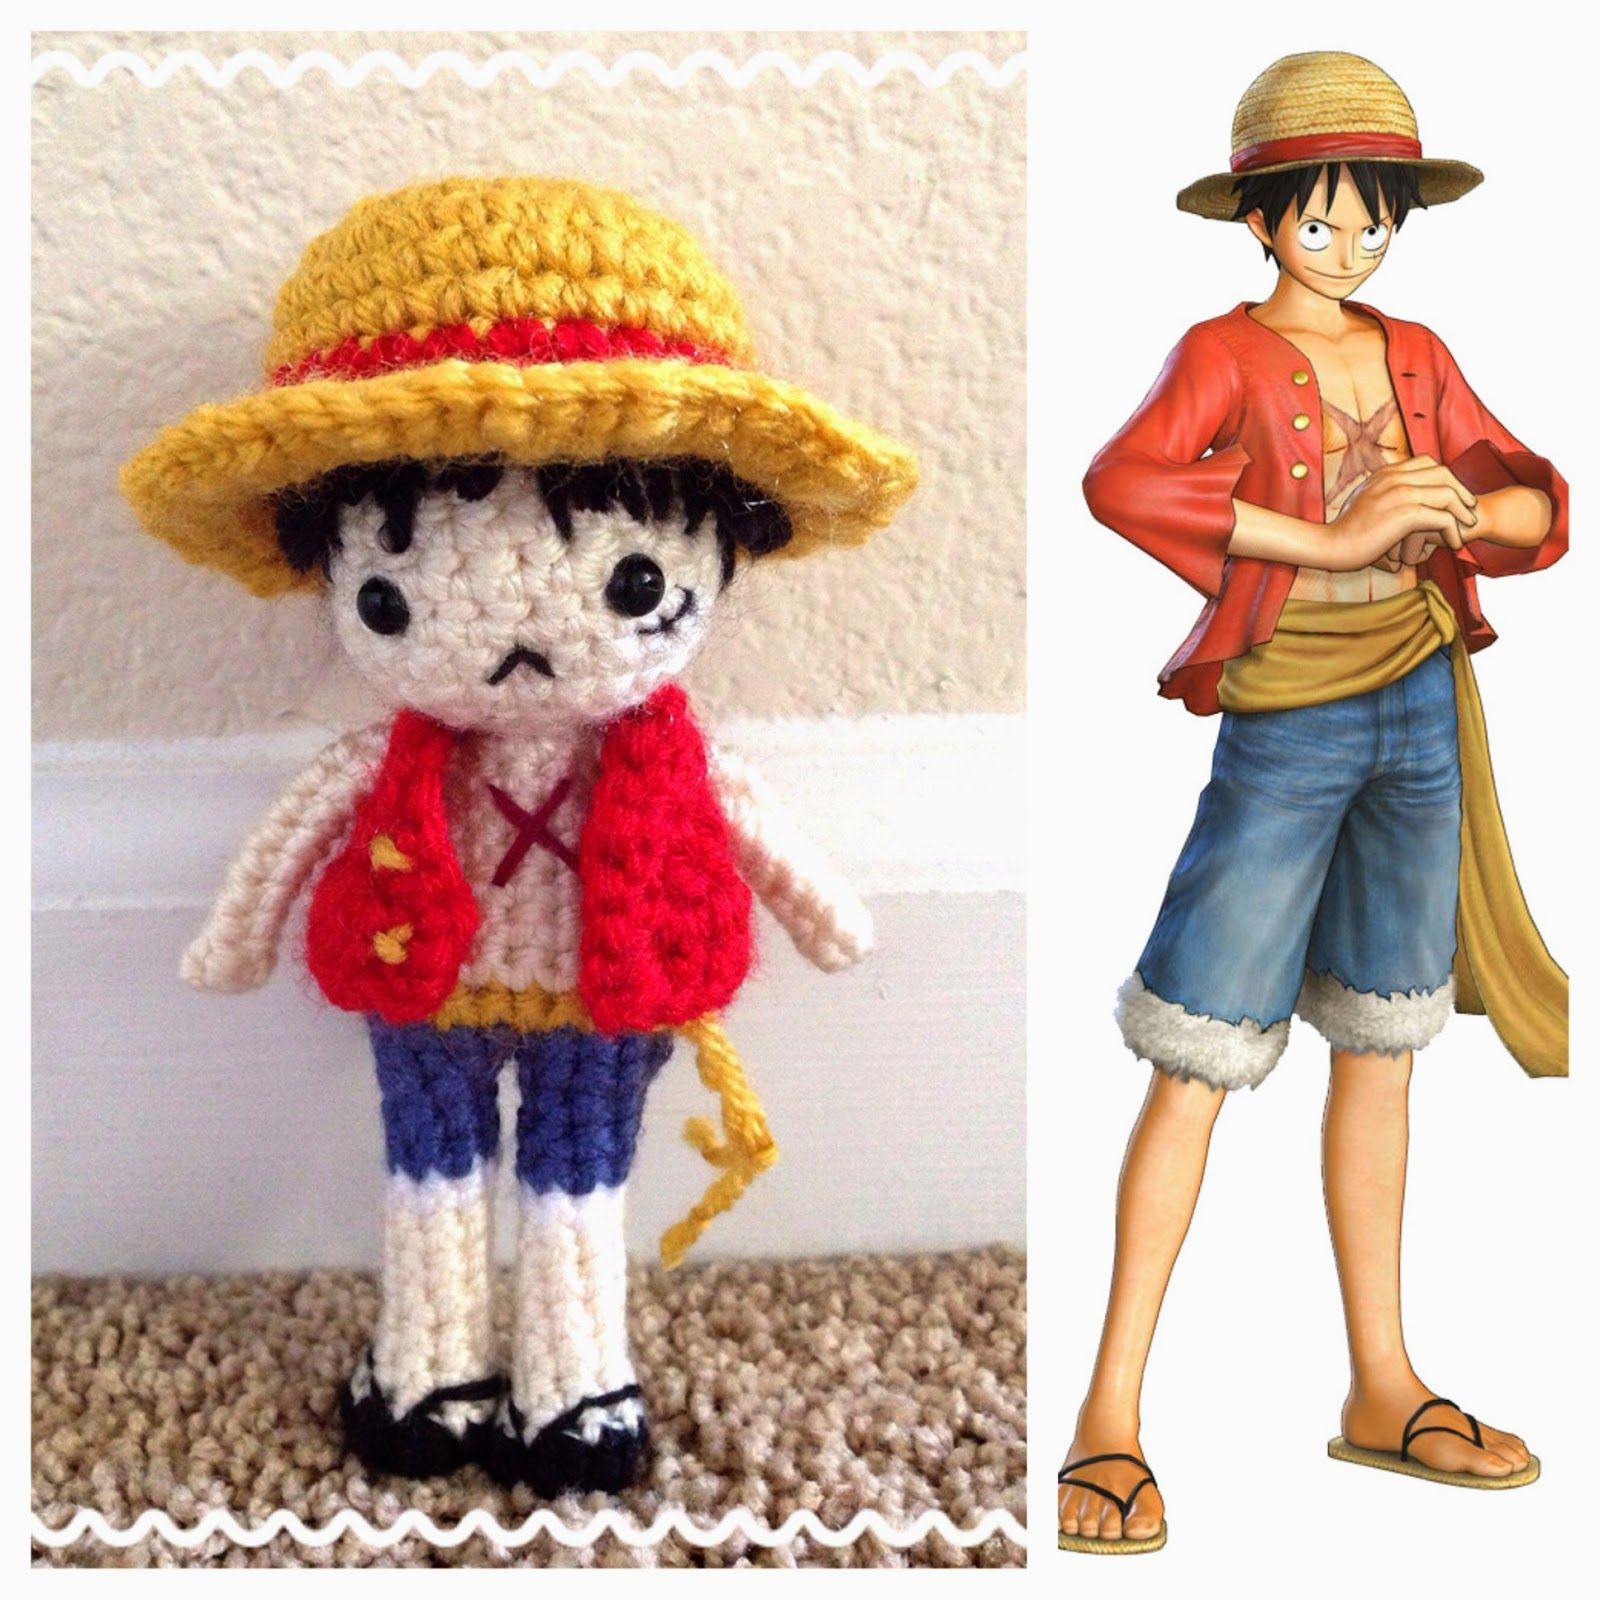 Monkey D. Luffy [ONE PIECE] - Amigurumi Crochet Doll Japanese anime manga craft pattern DIY straw hat yarn